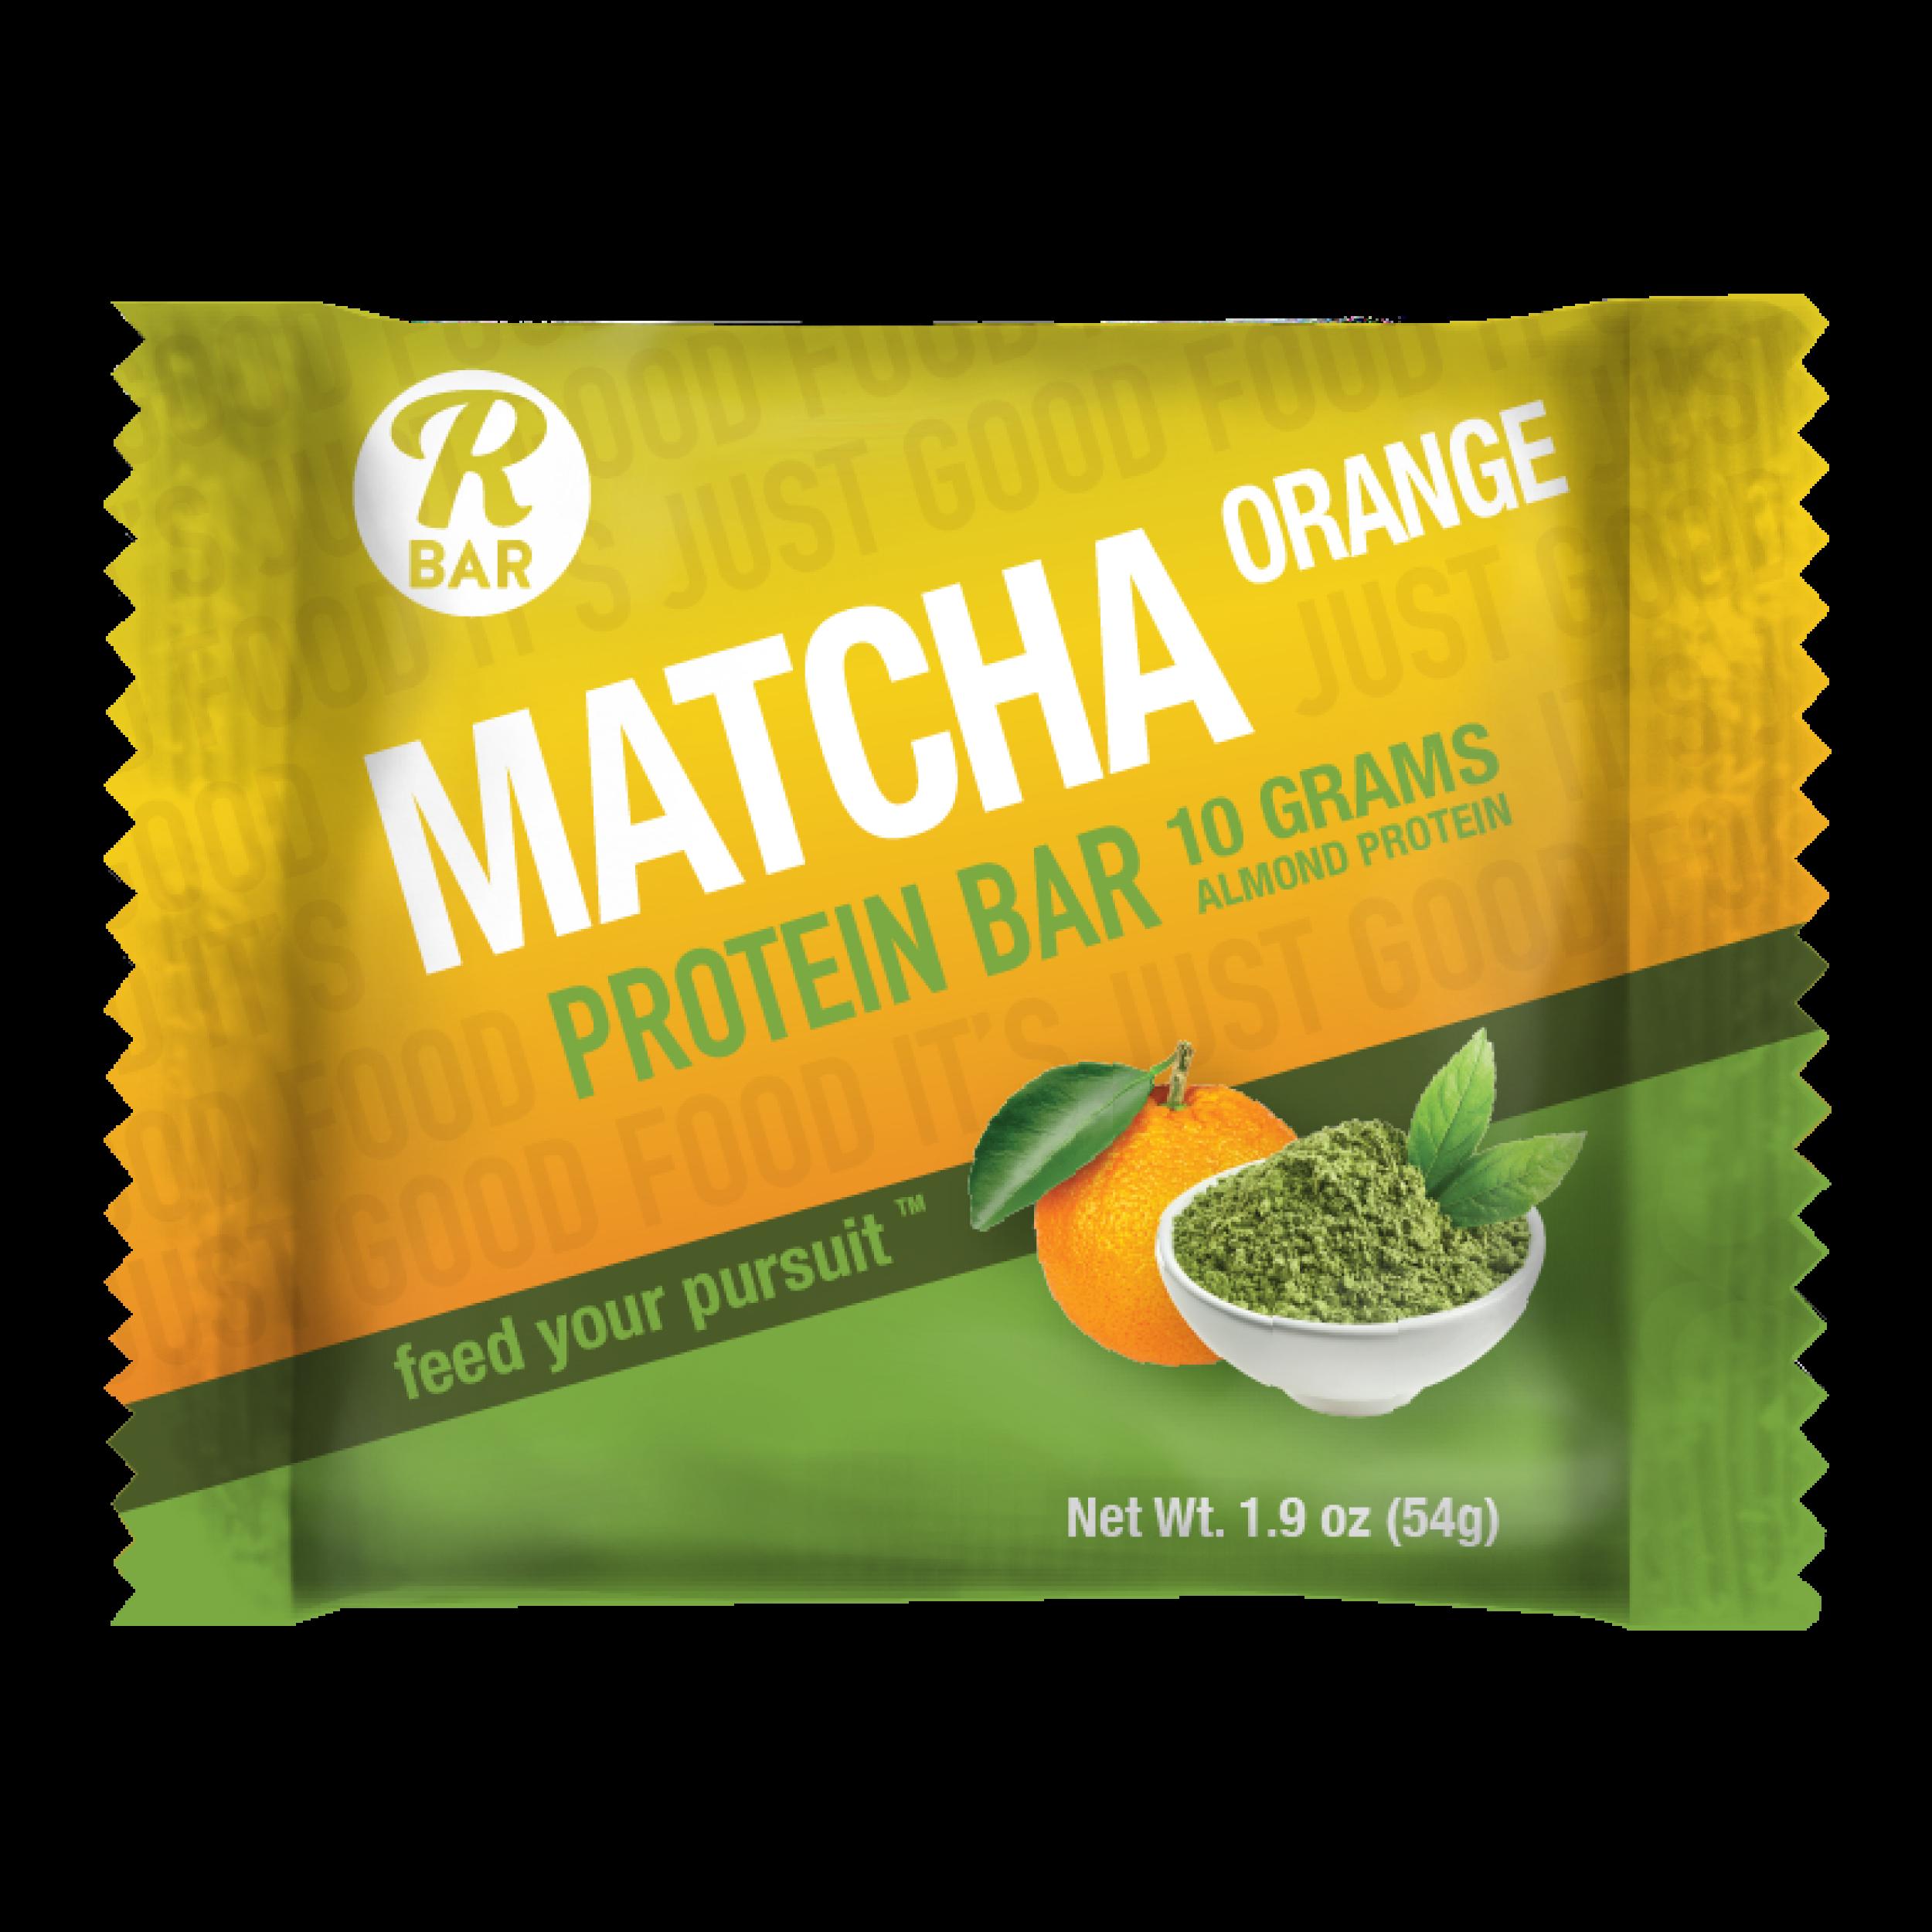 Matcha Orange Protein Bar